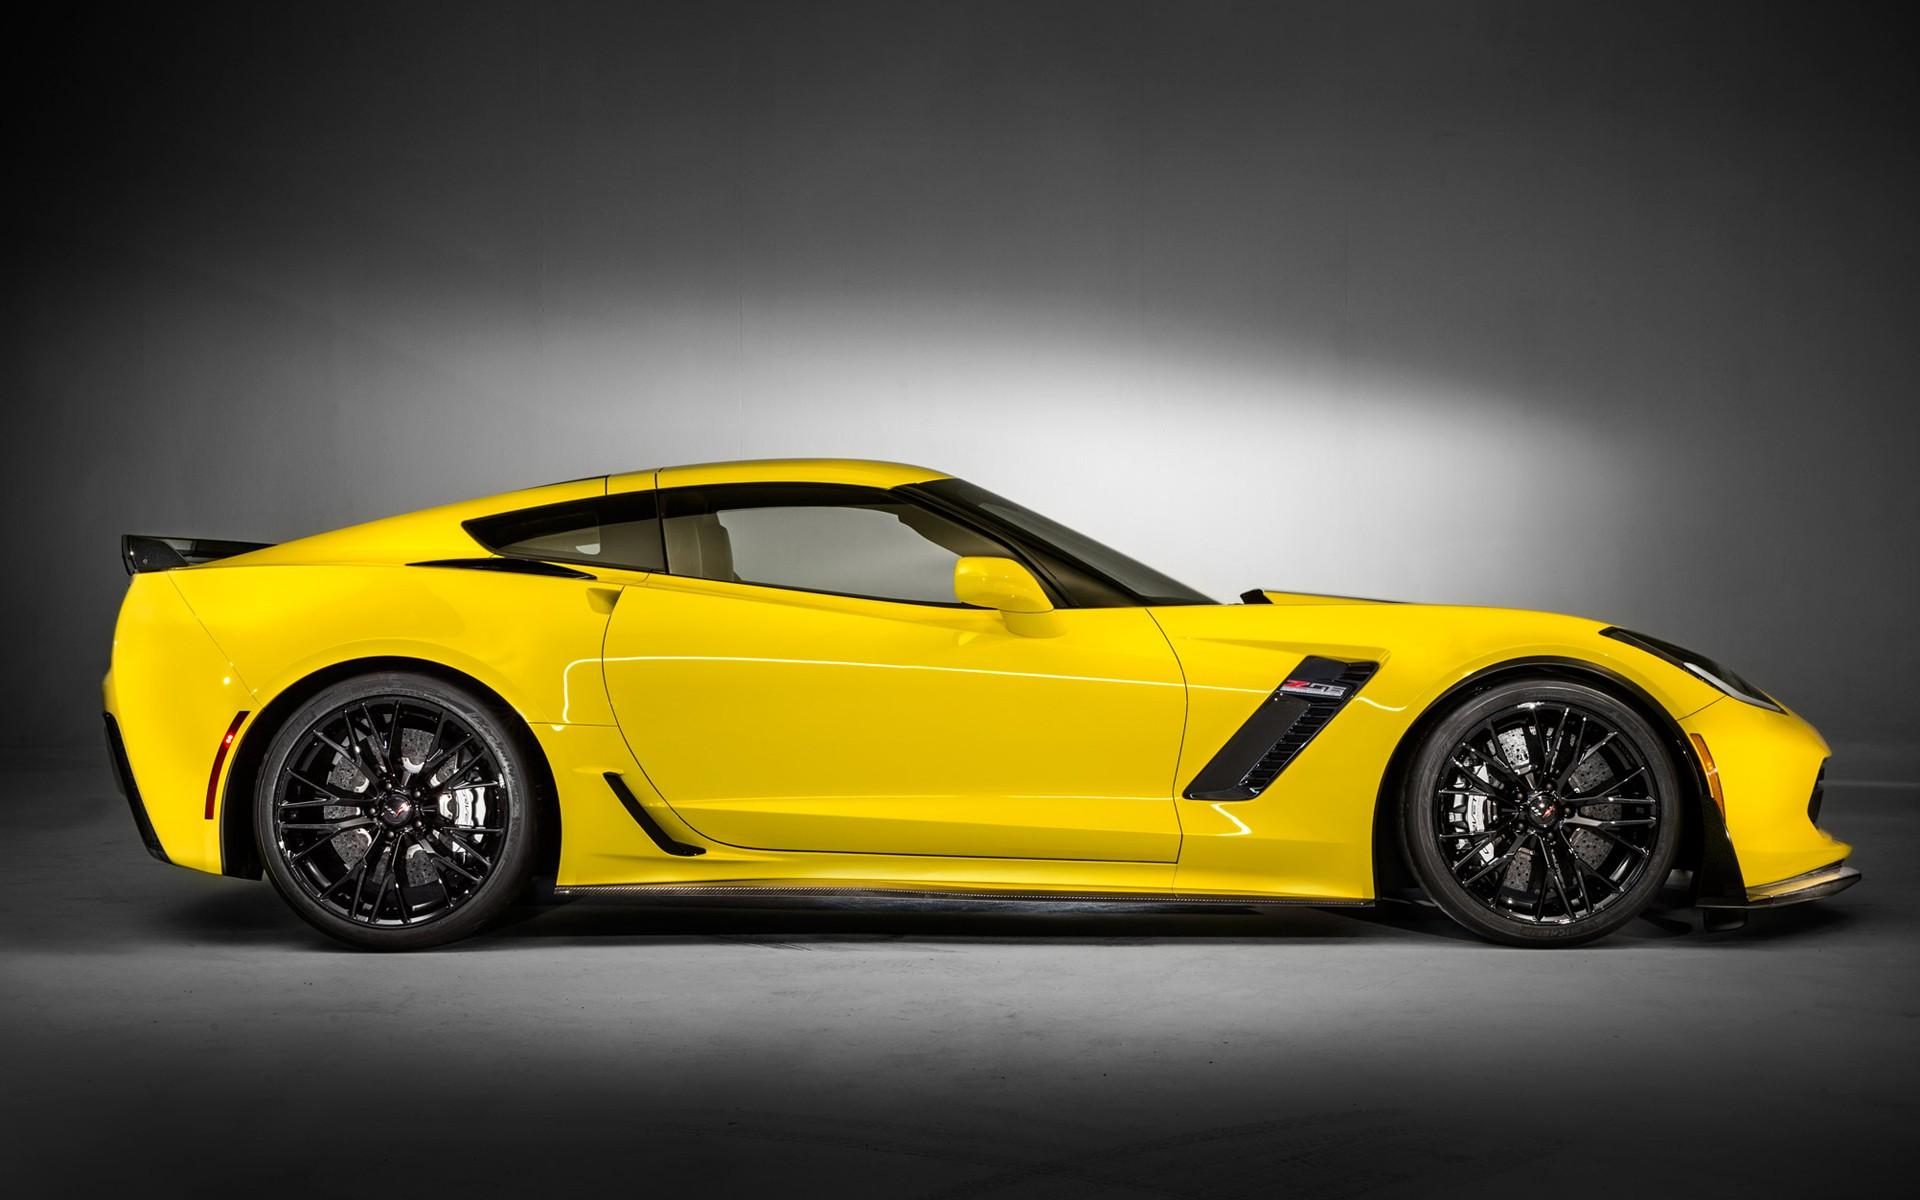 1920x1200 Px 2015 Chevrolet Corvette Z06 Car Side View Yellow Cars